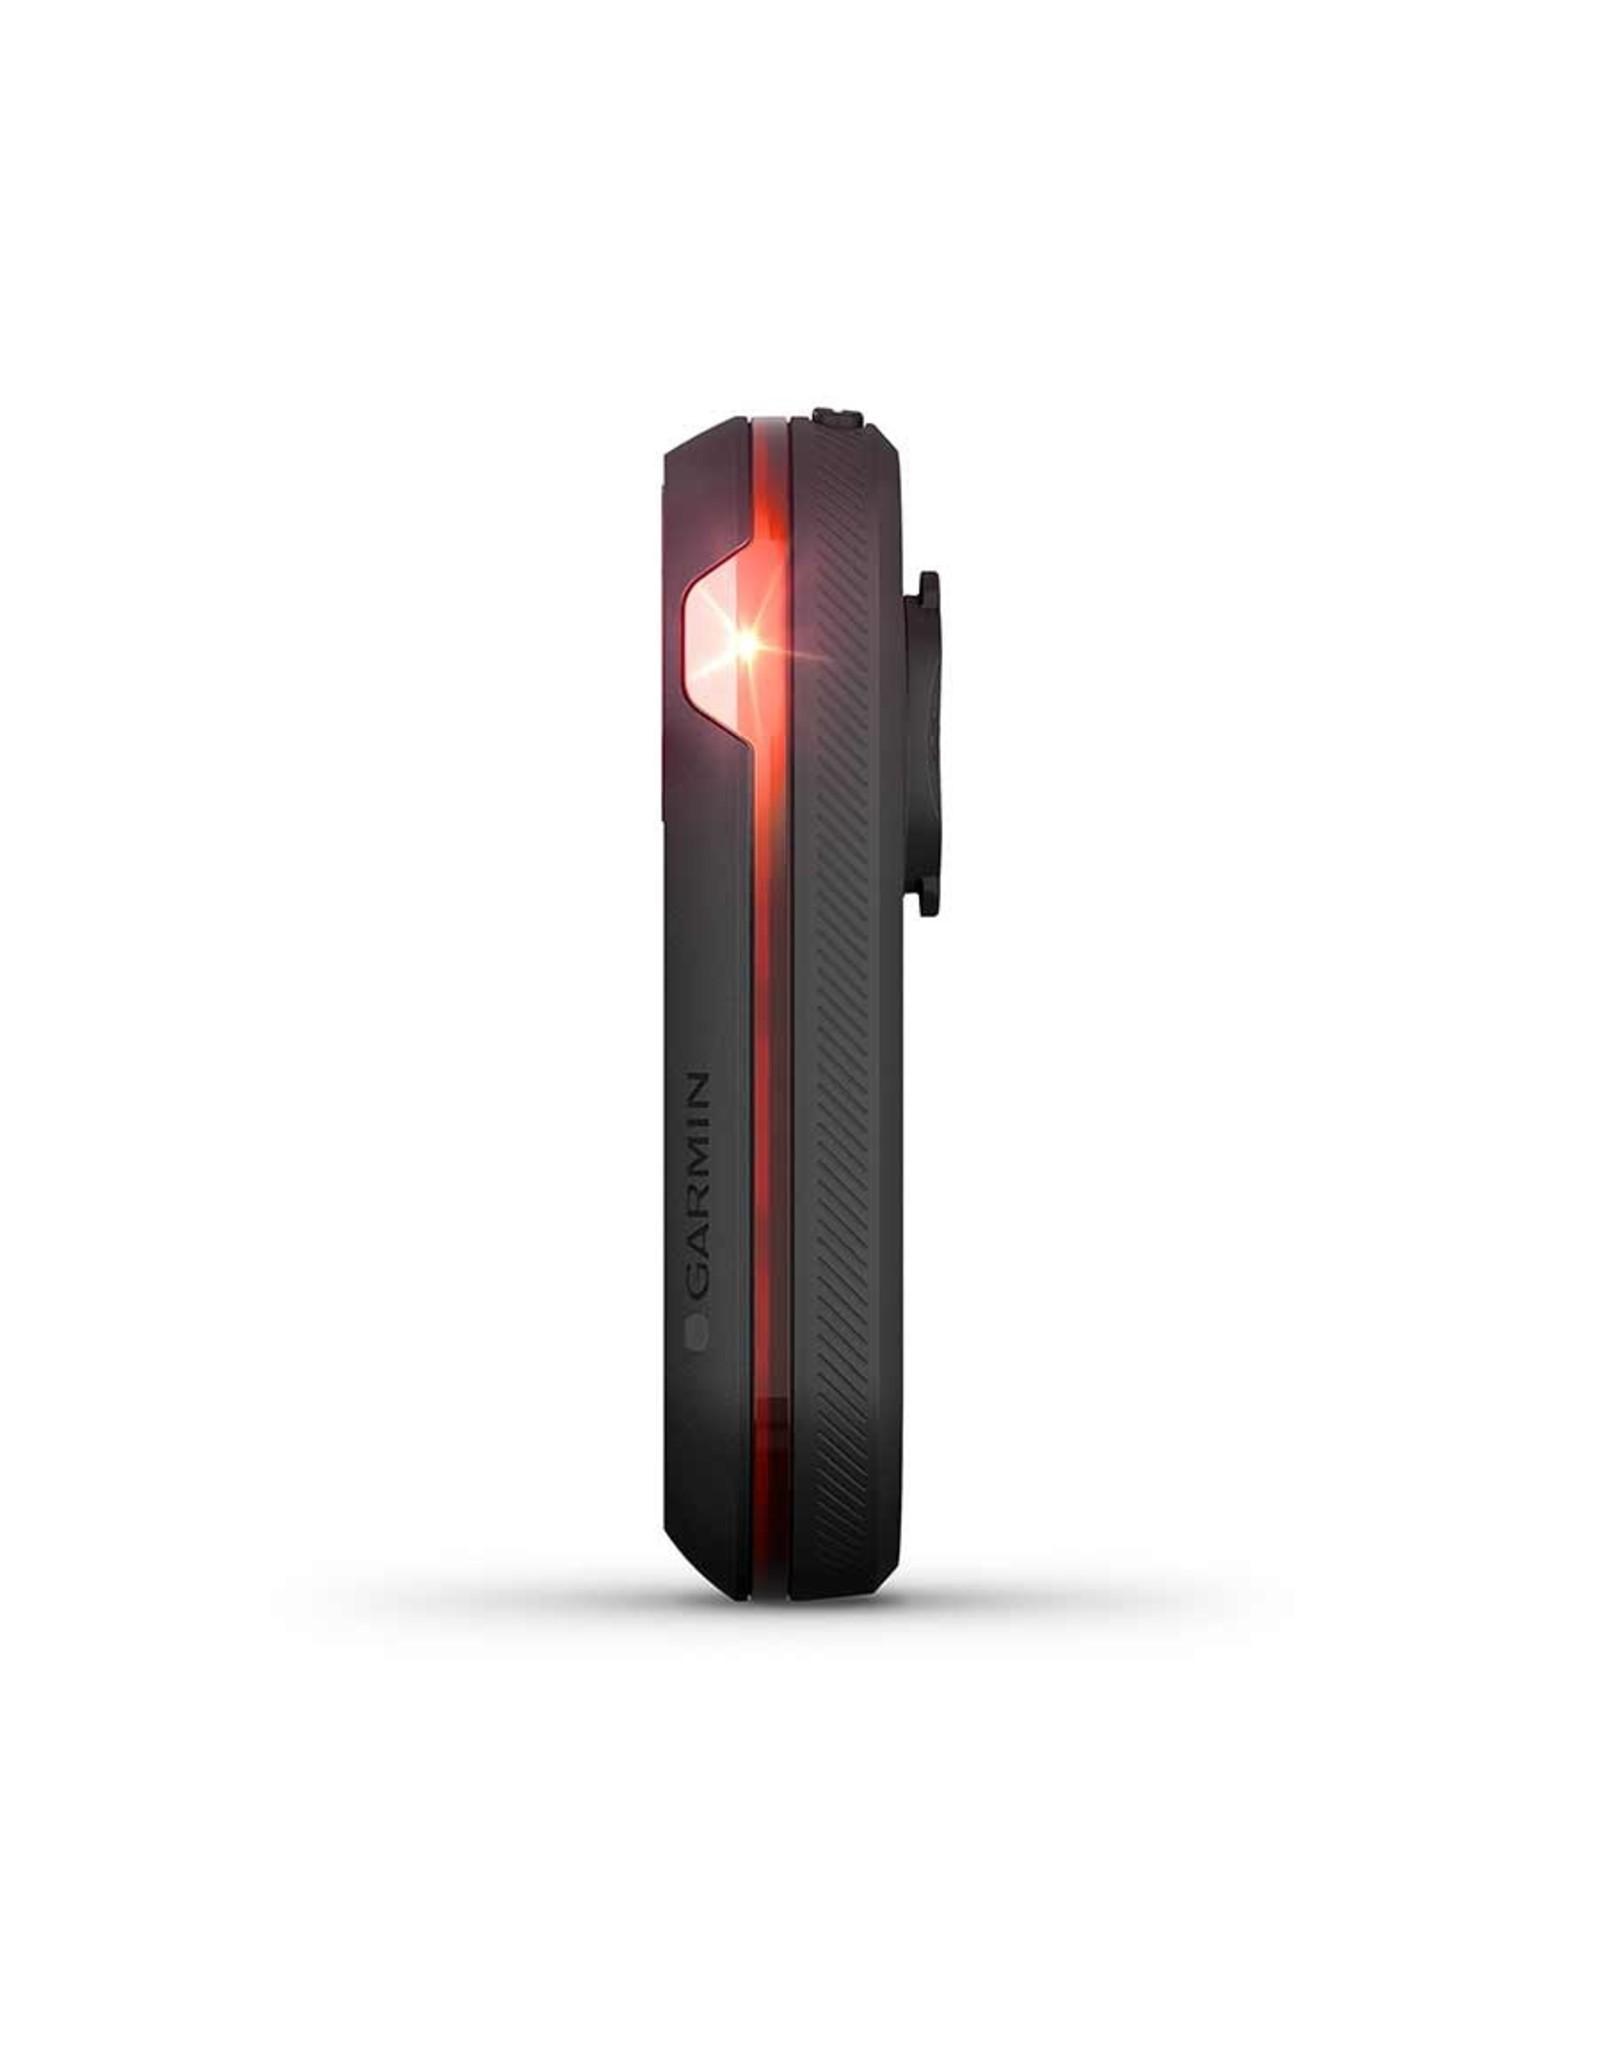 Garmin Garmin, Varia RTL515, Rearview Radar with Taillight, Black, 010-02376-00